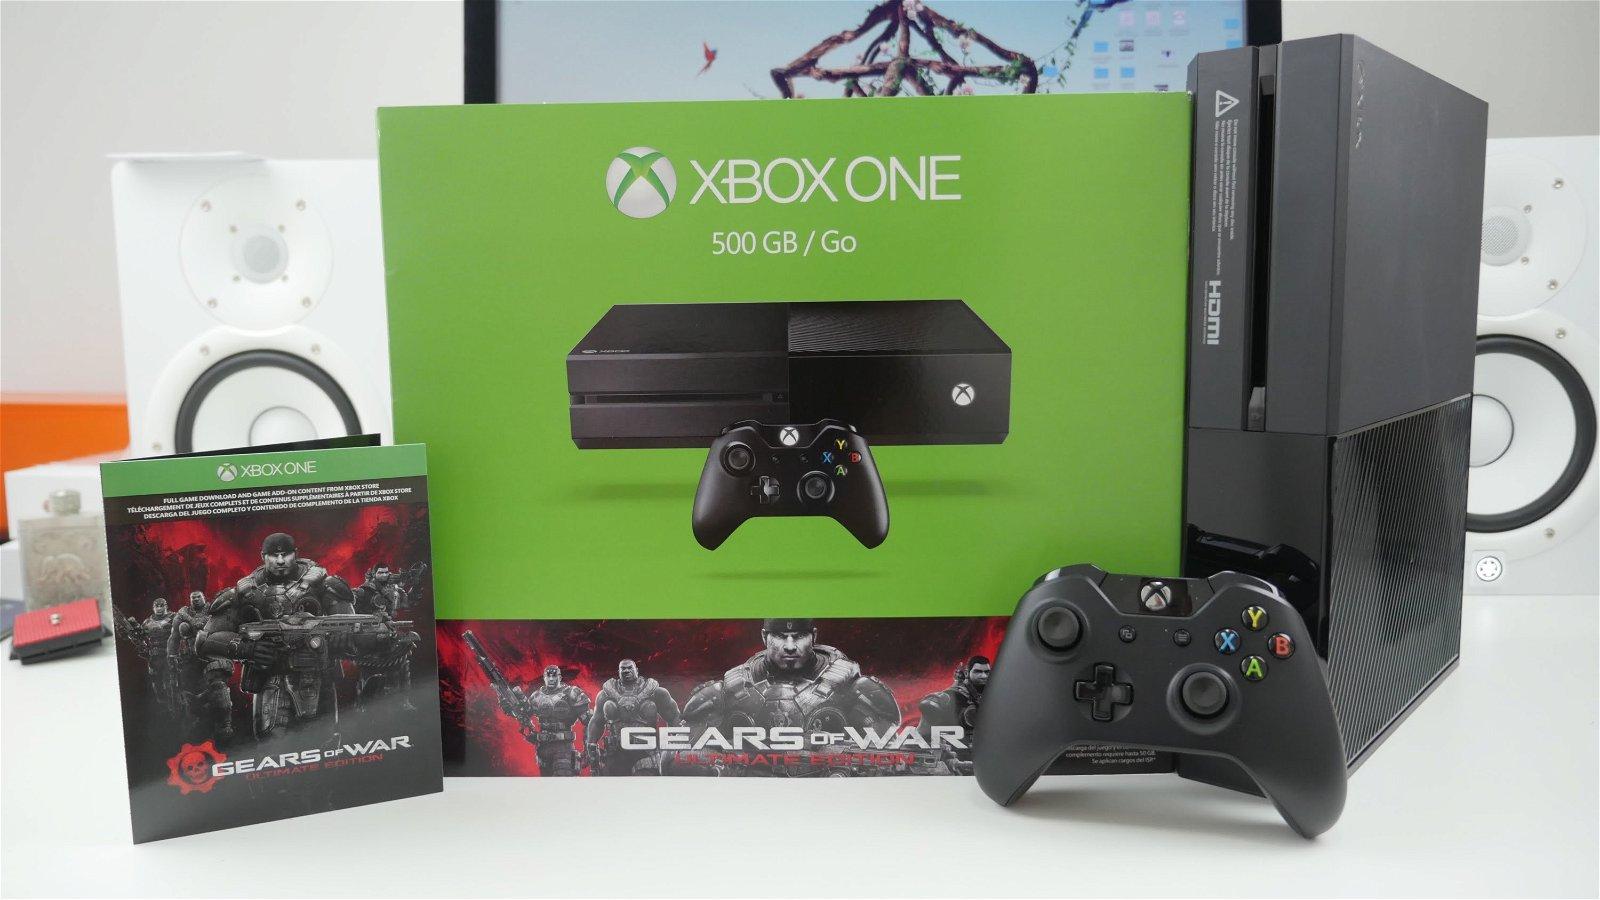 Xbox One Bundles Price Drop To $280 1